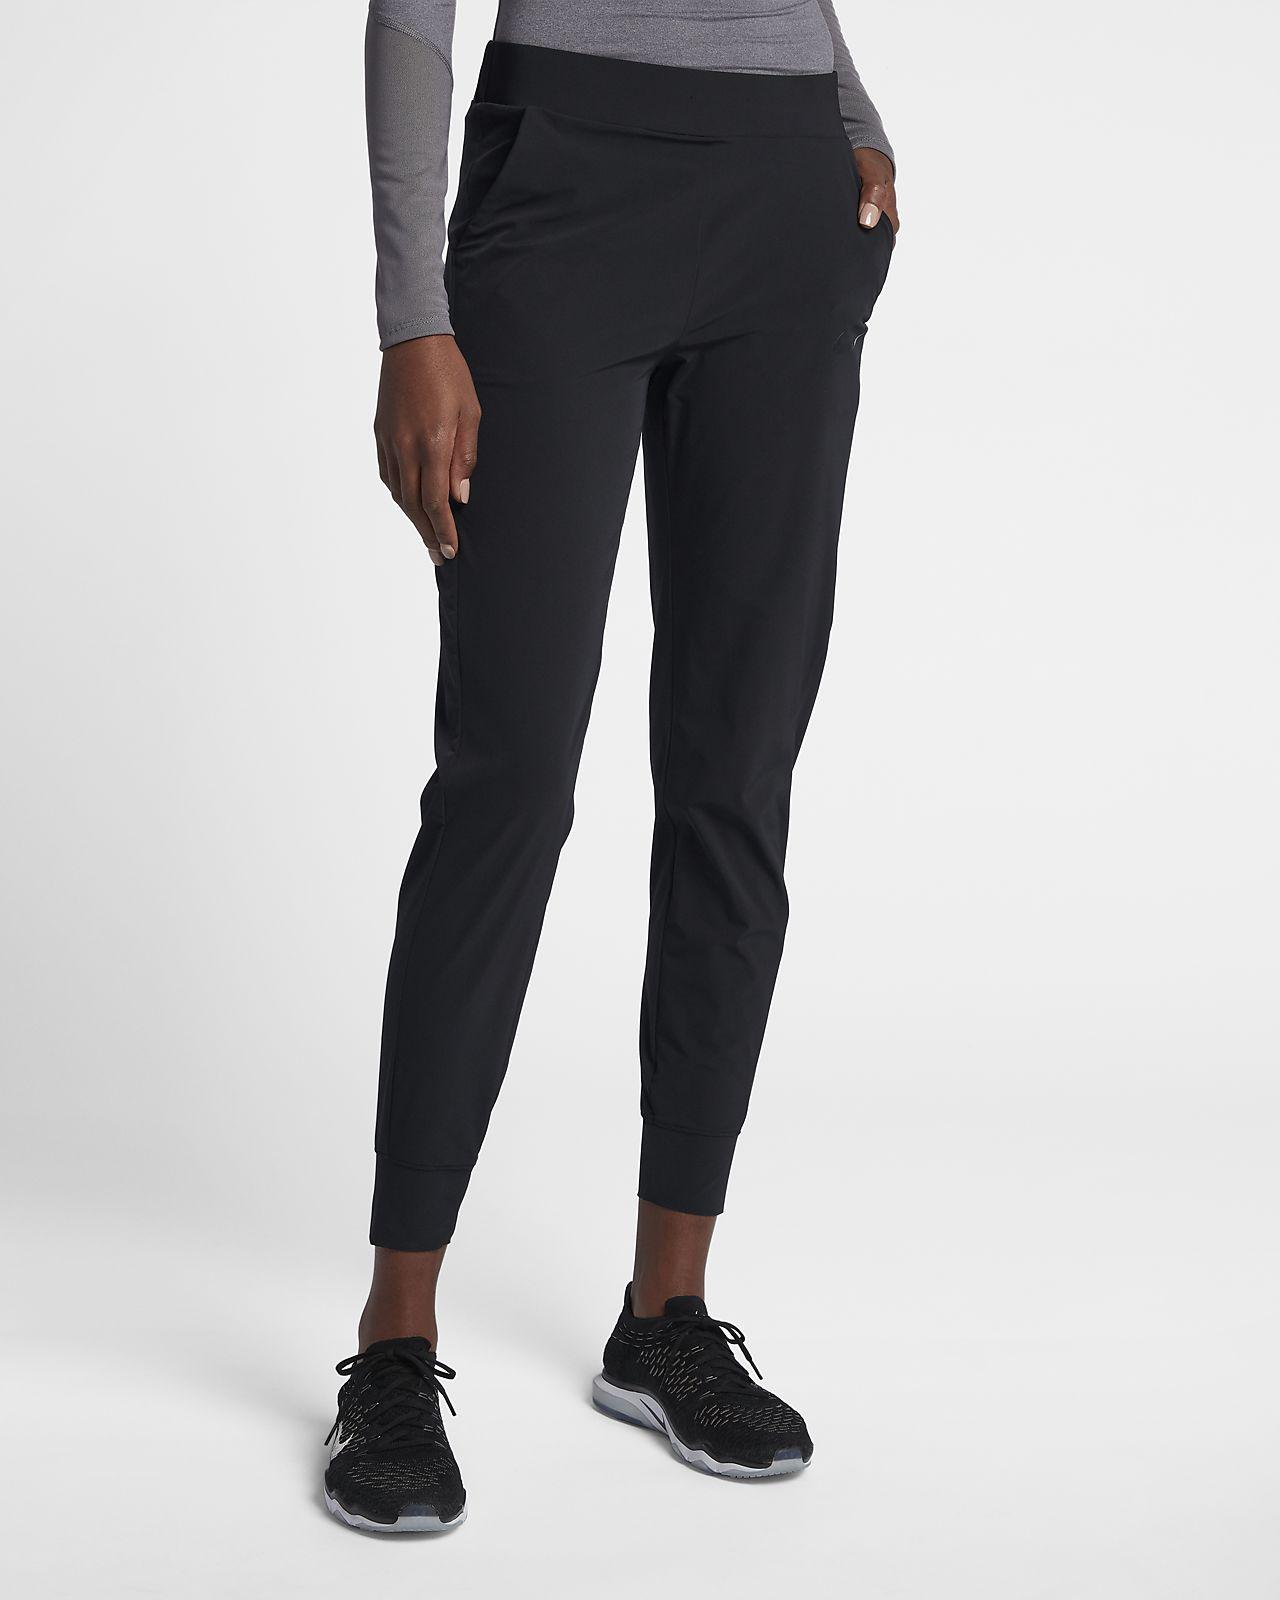 Nike Bliss Lux 女款中腰訓練運動褲